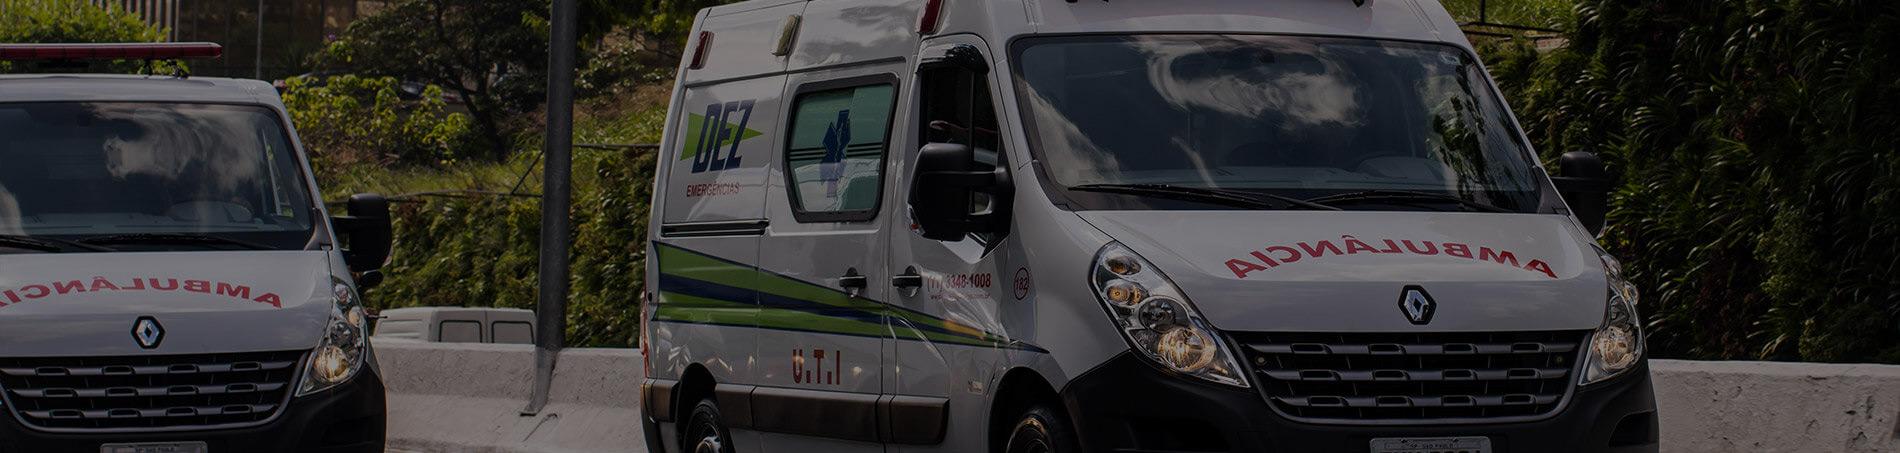 ambulancia-particular-3